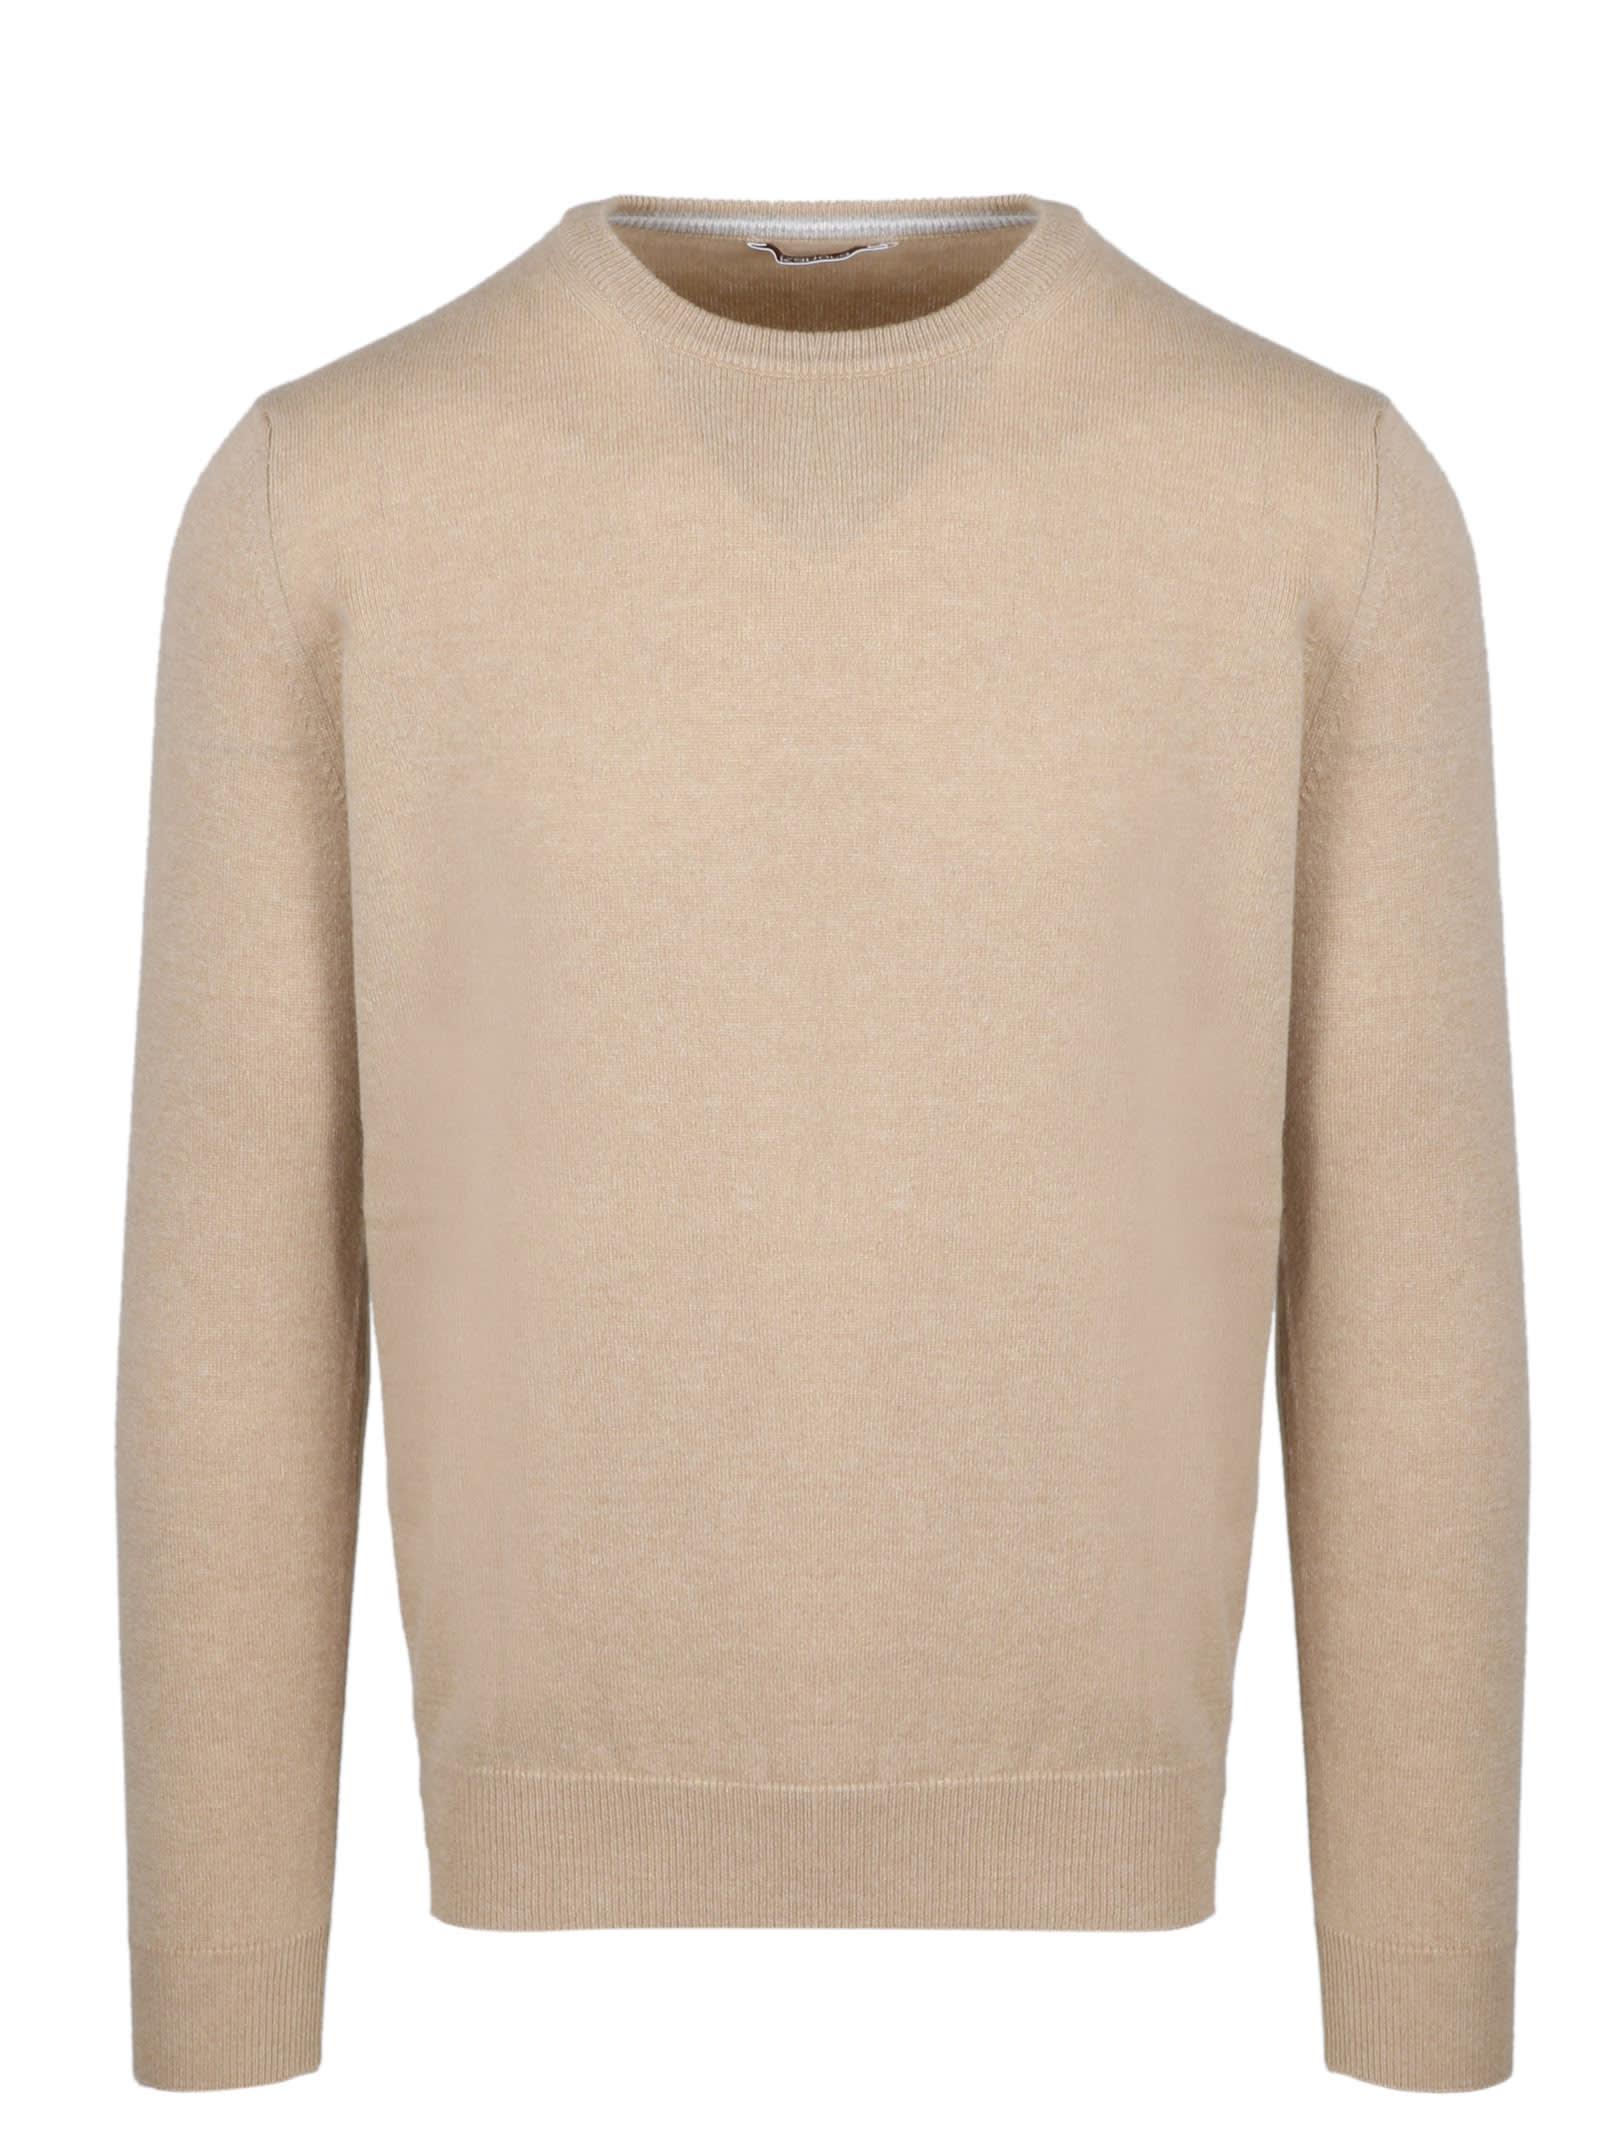 Roundneck Sweater